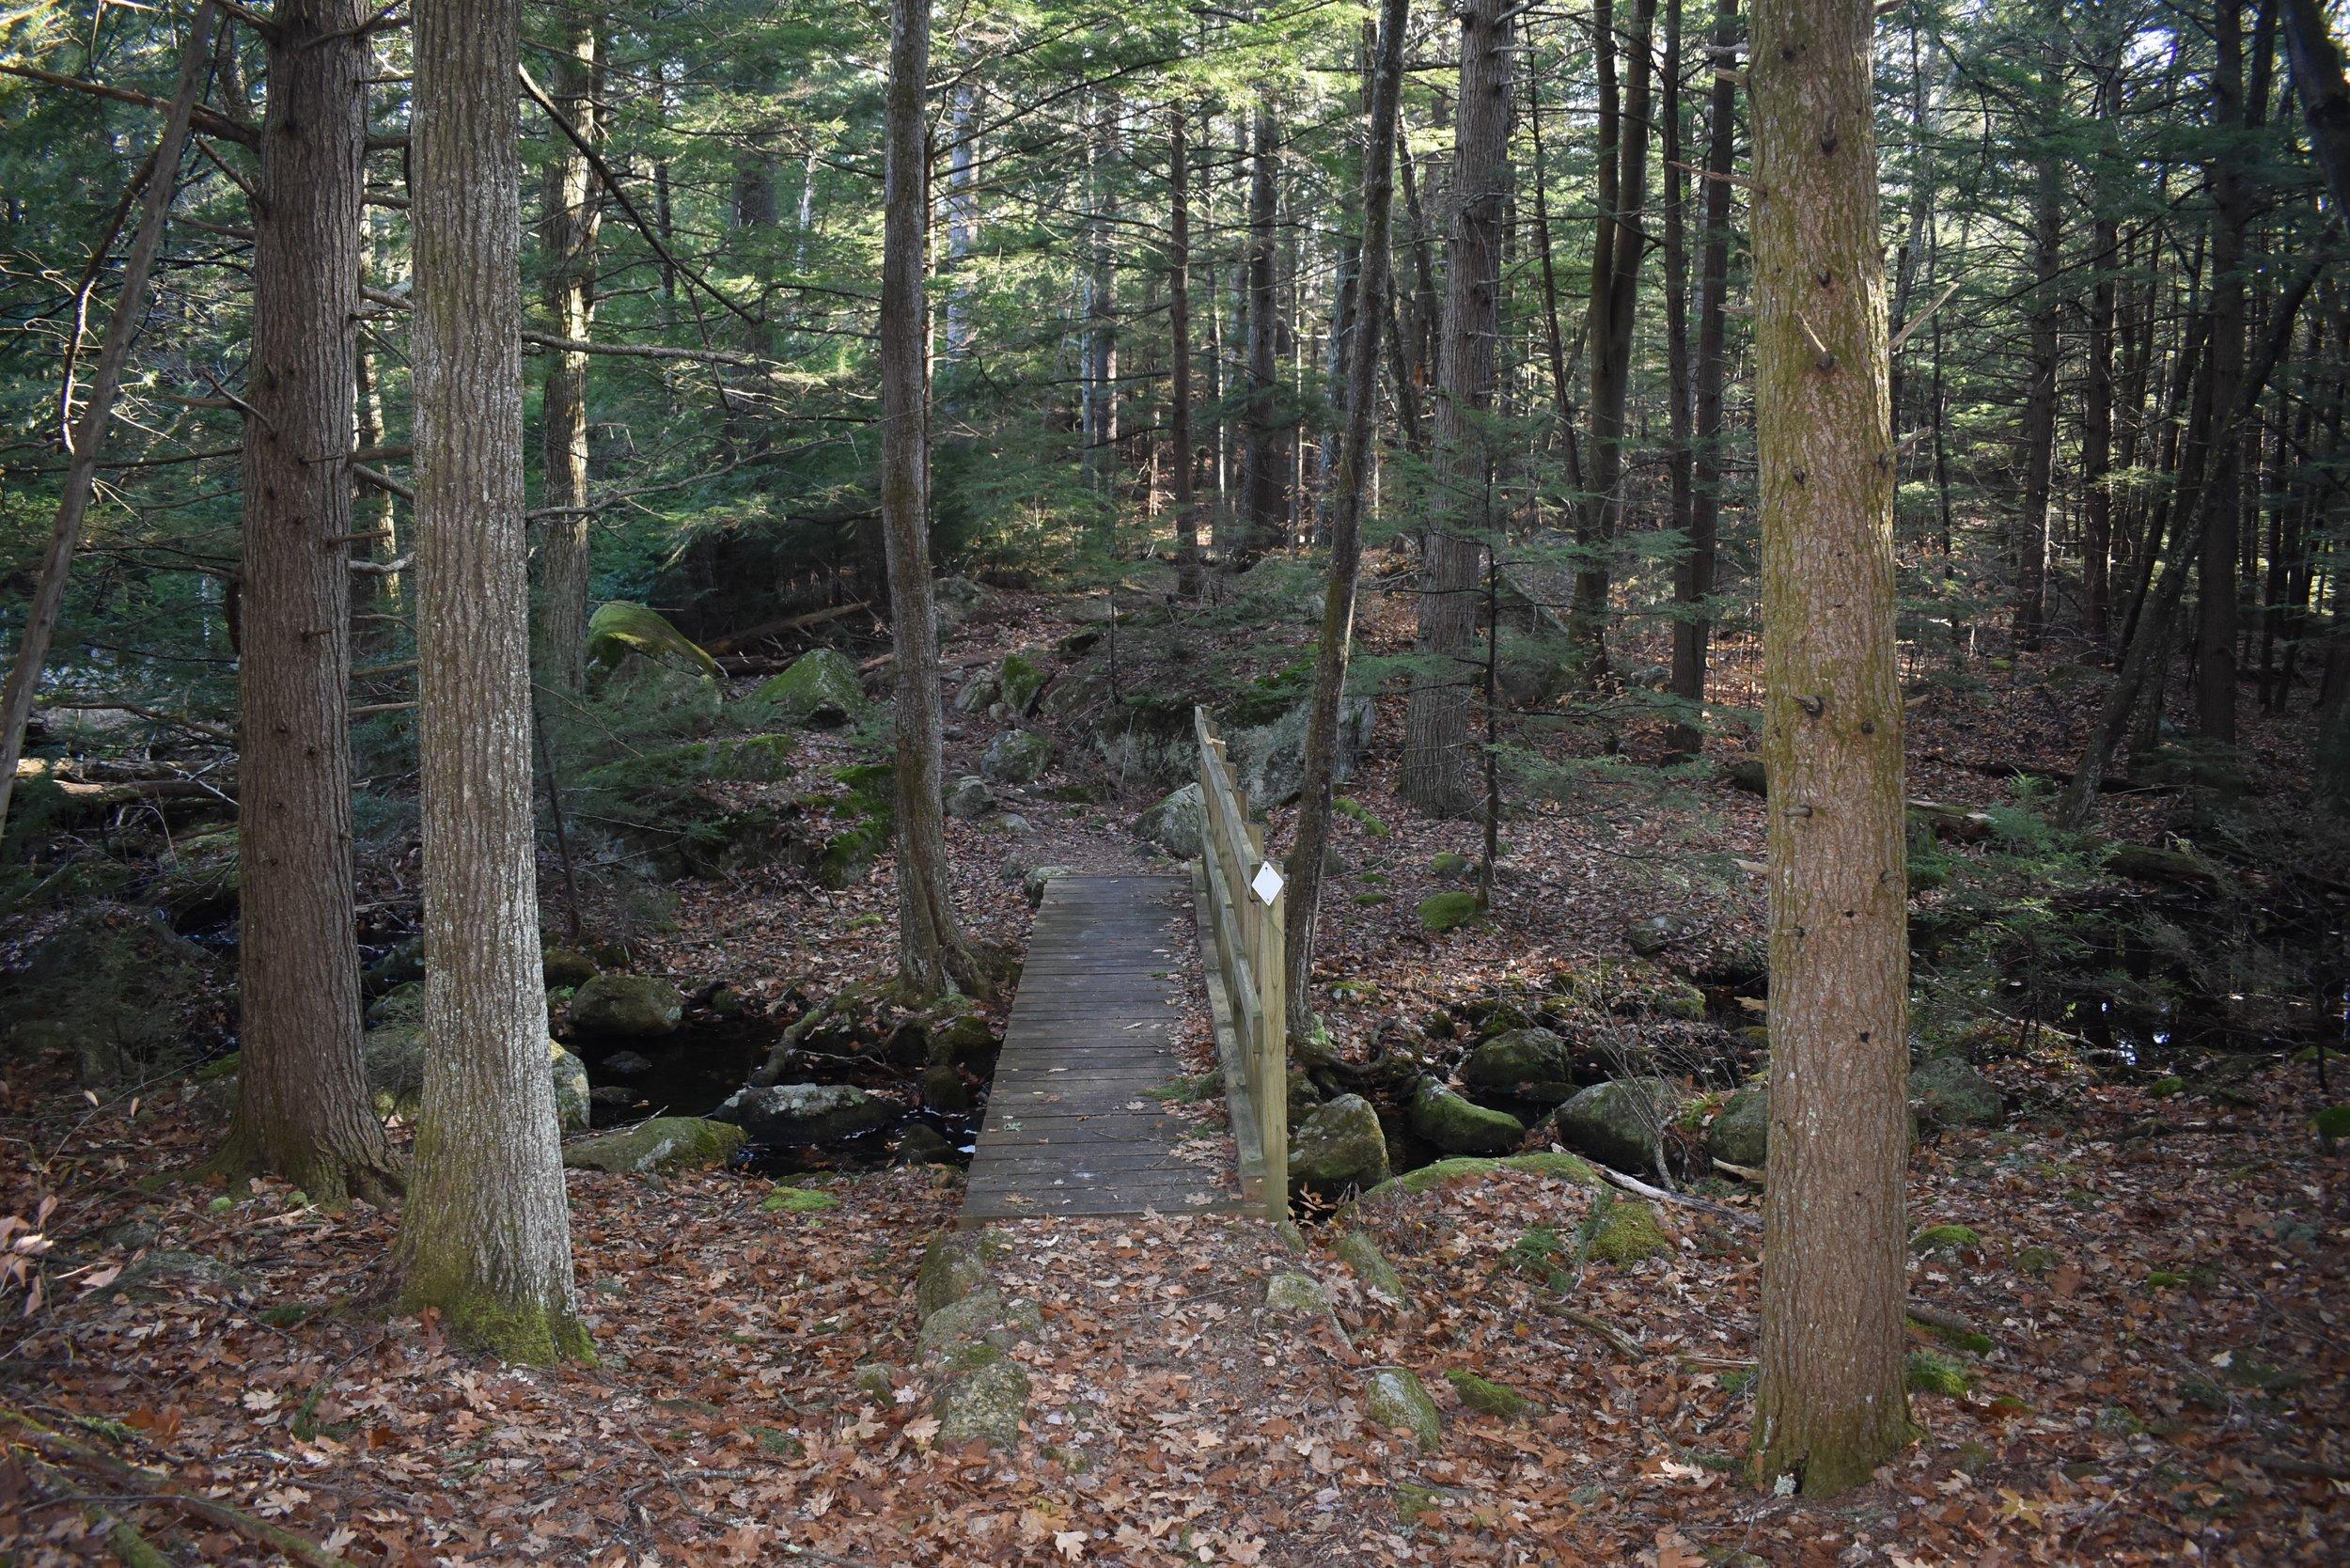 An insurmountable stream.